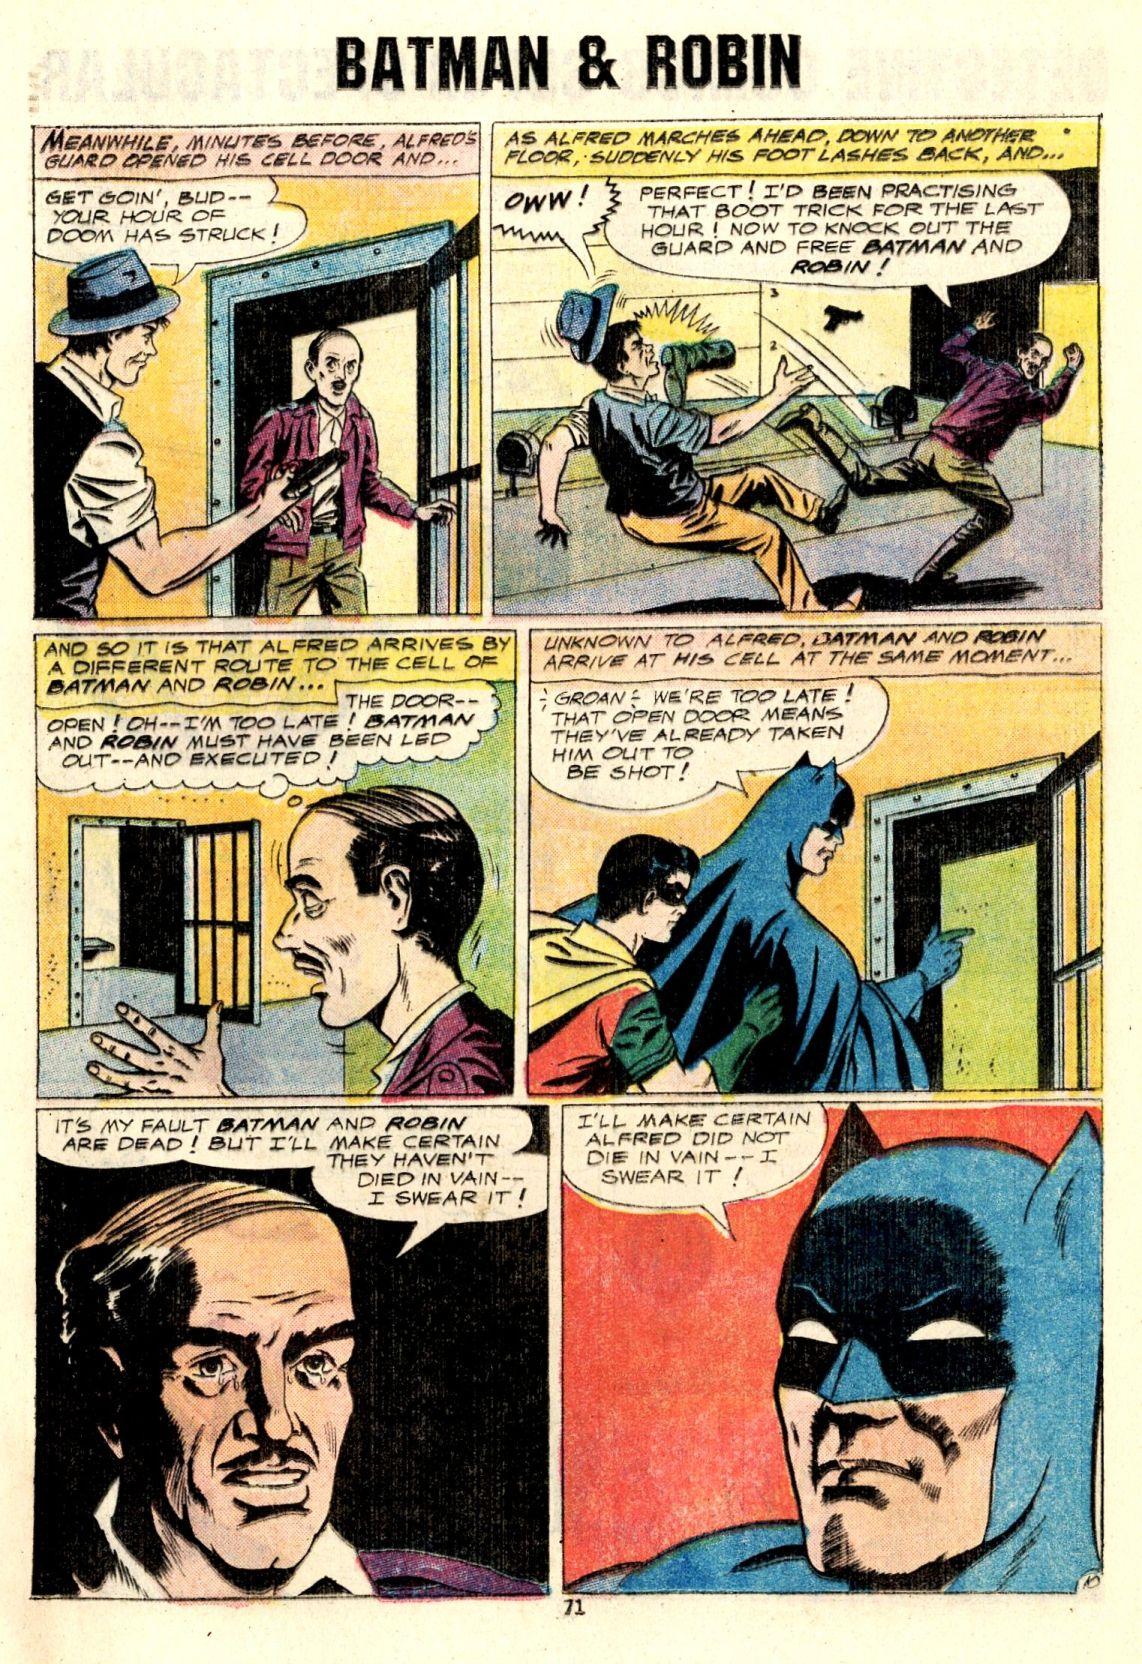 Detective Comics (1937) 438 Page 71